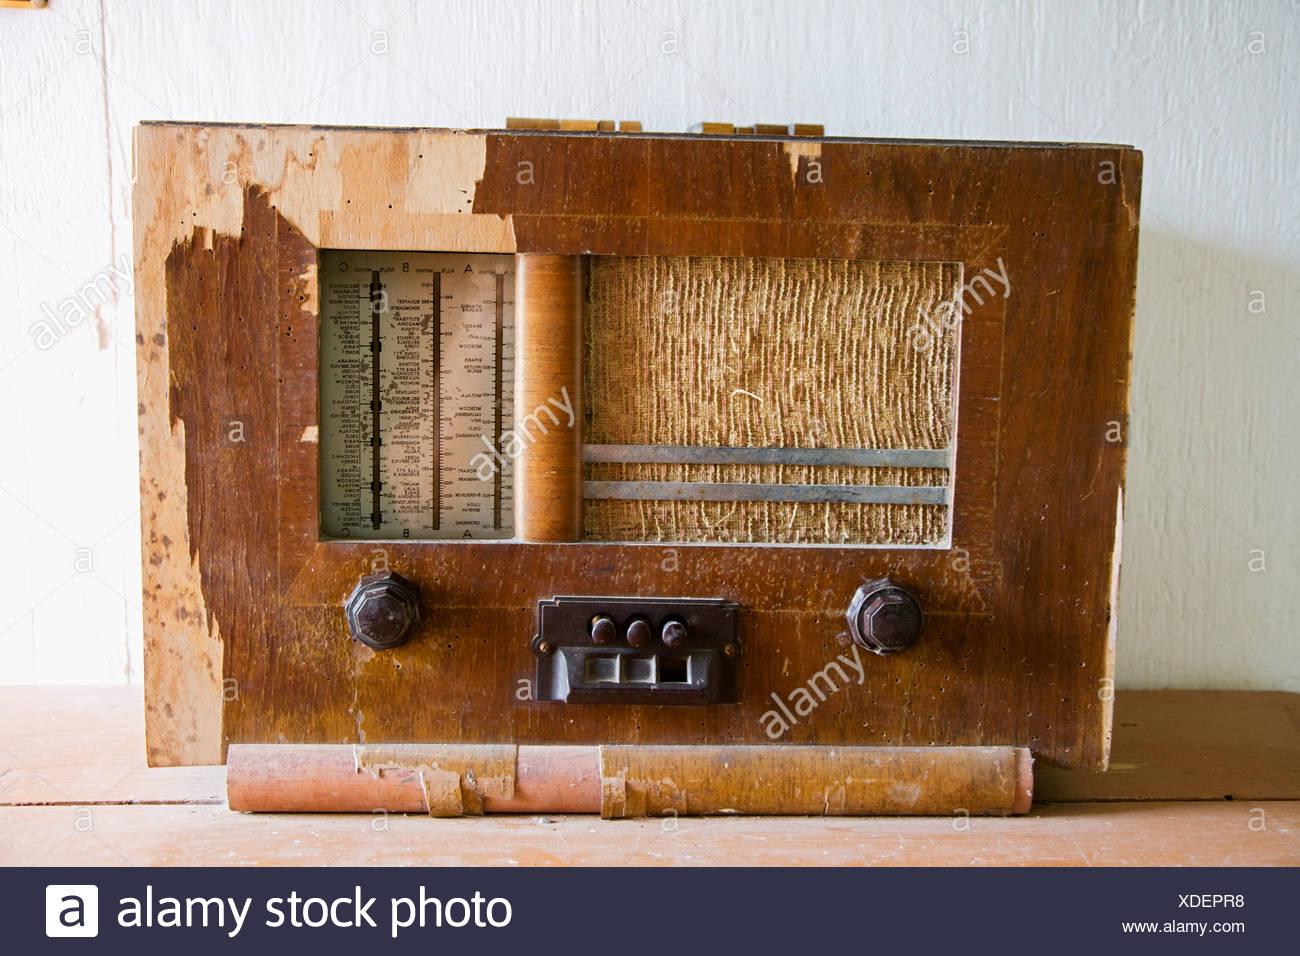 Republic of Ireland, County Sligo, Sligo folk Park, old radio - Stock Image